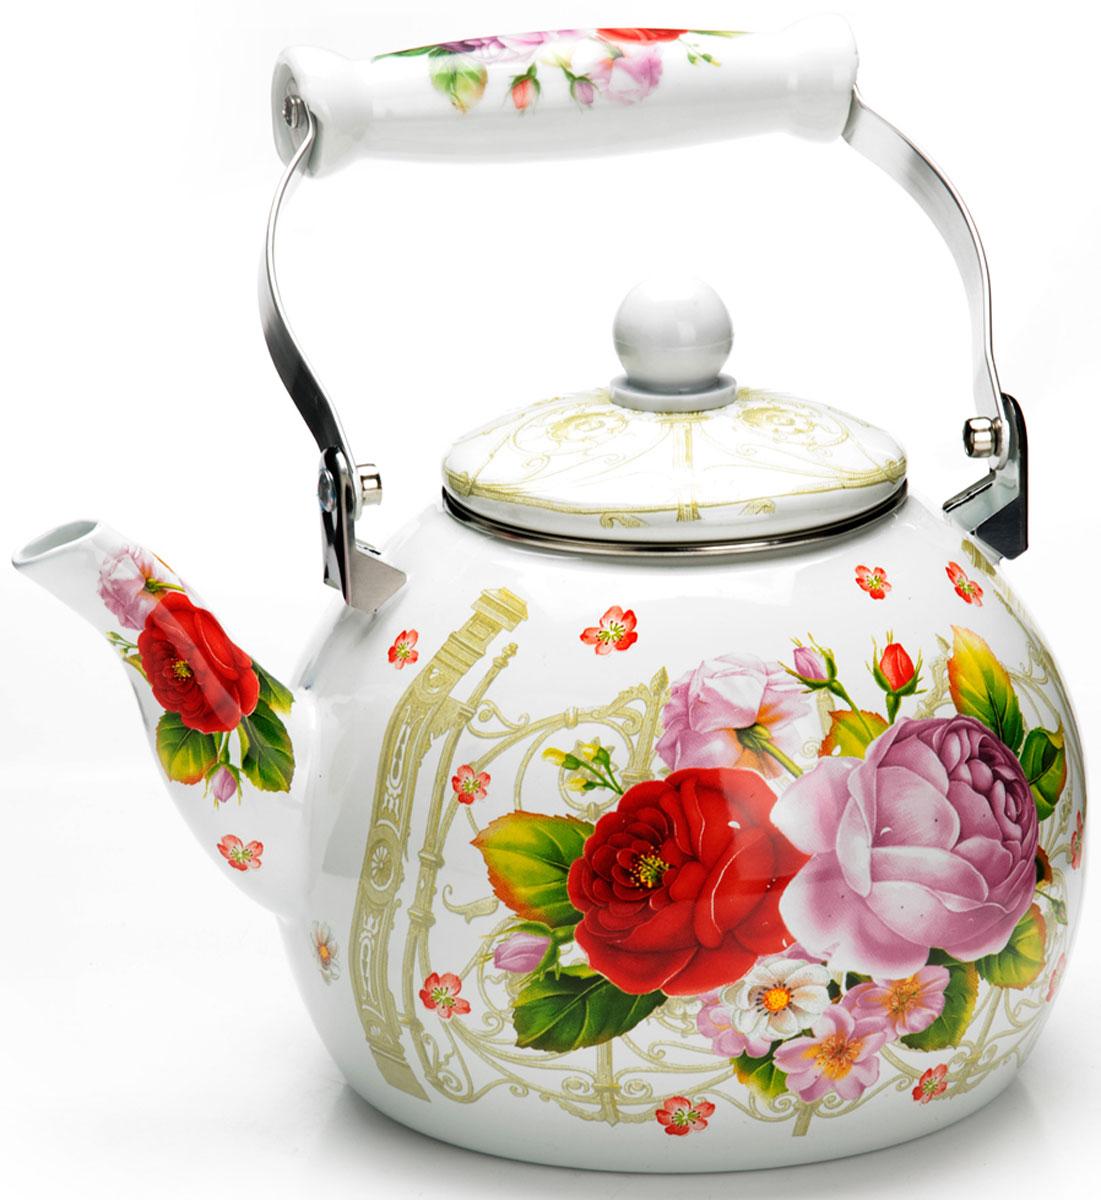 Чайник Mayer & Boch Цветы, 3 л. 2649926499